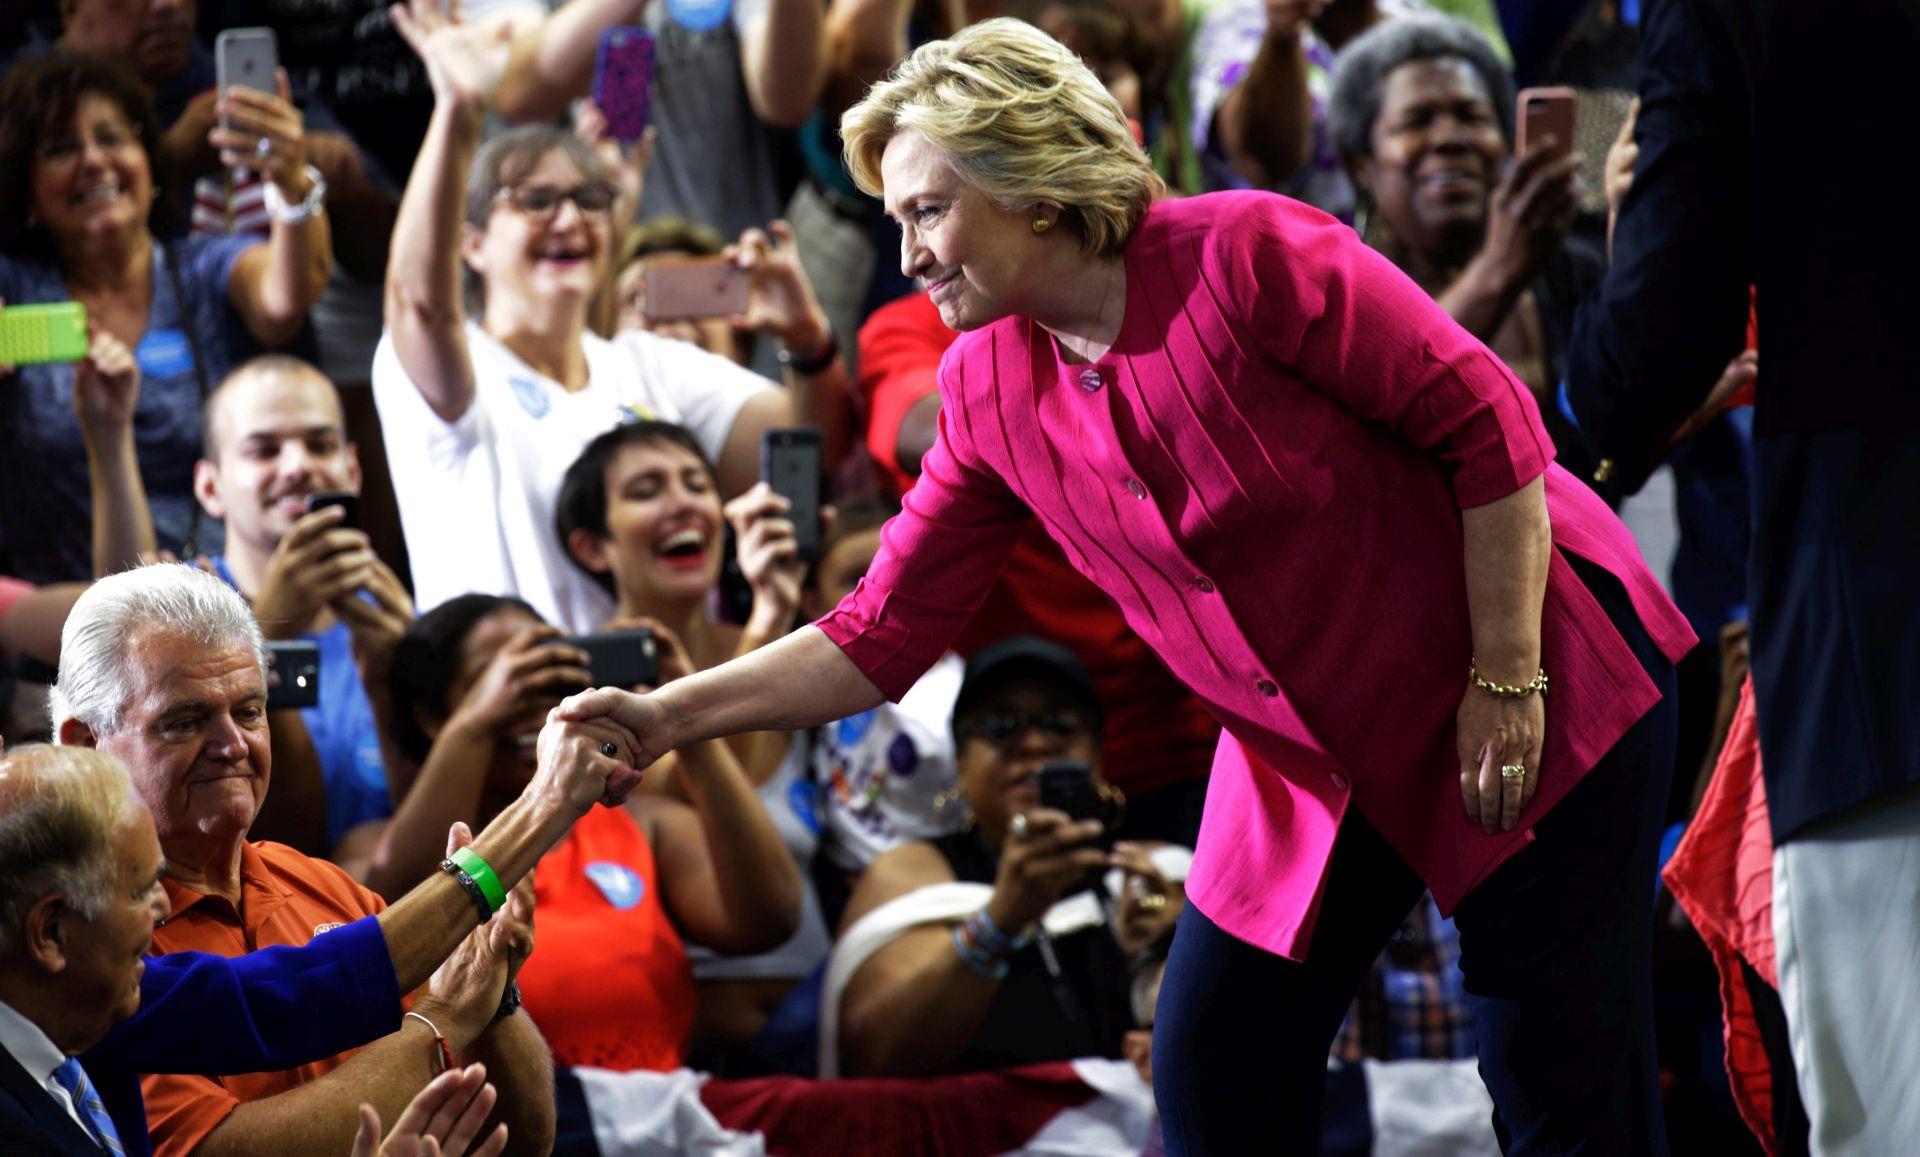 JULIAN ASSANGE: 'Isti izvori financiraju zakladu Clinton i ISIS'